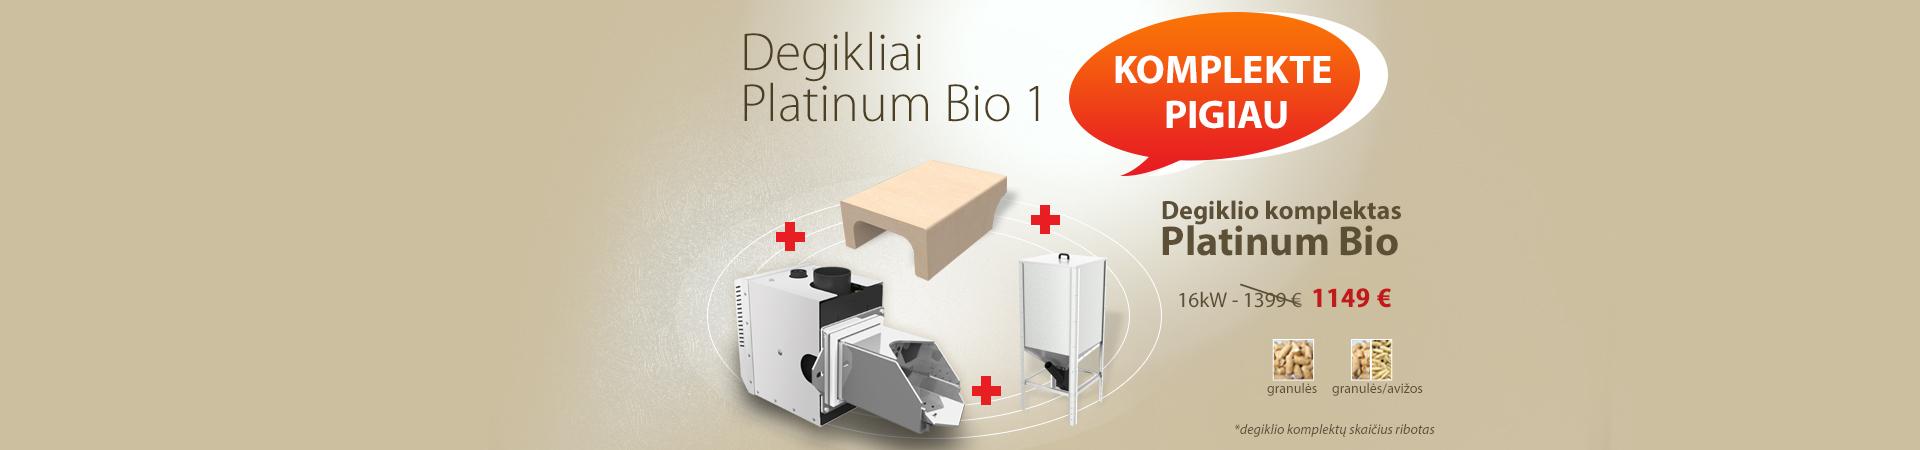 Platinum Bio Komplektas - akcija